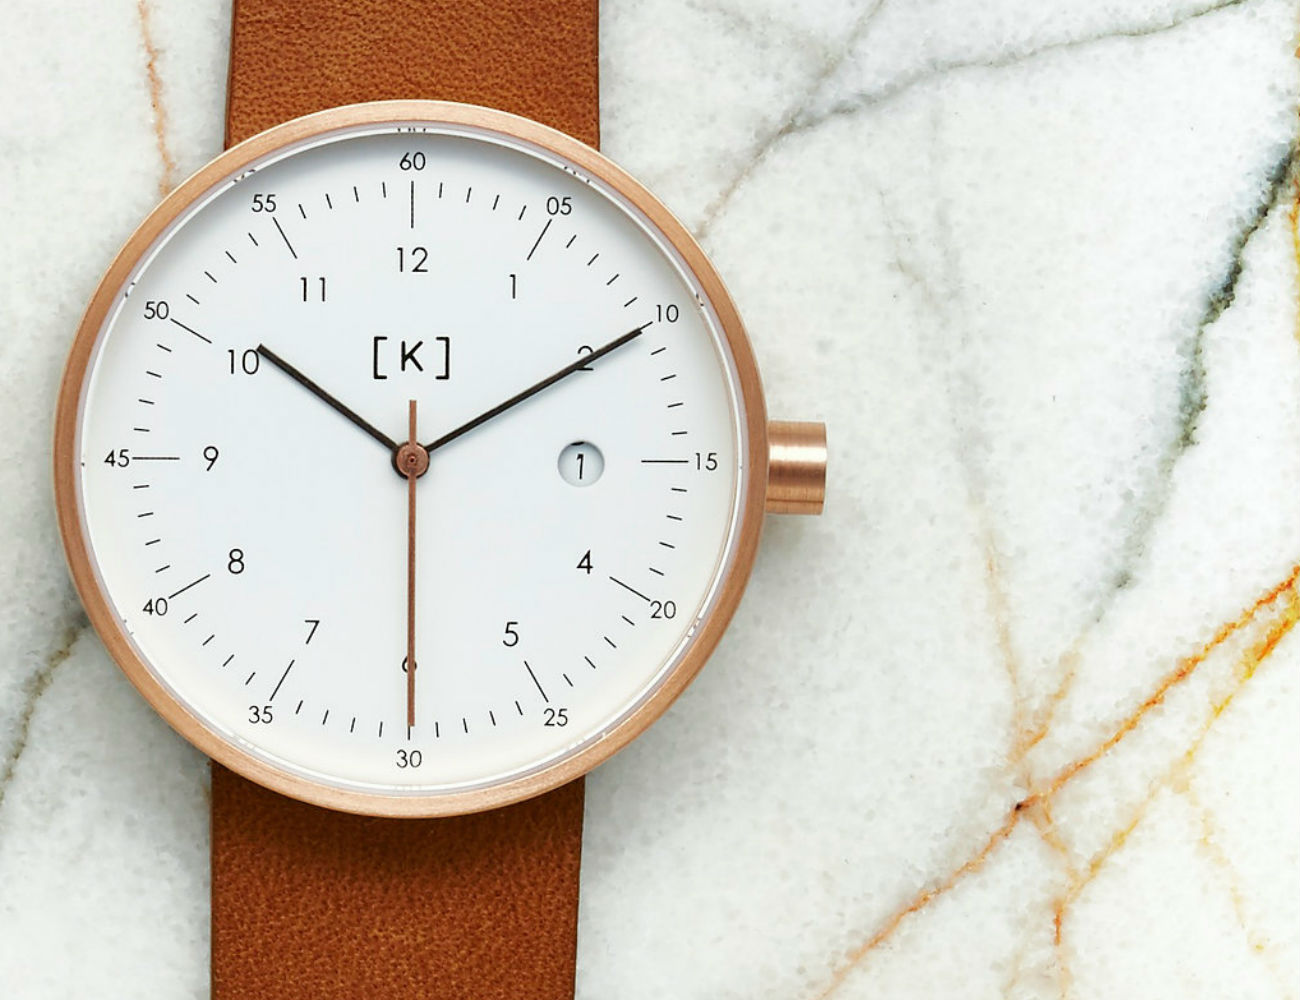 iKi A Series Minimalist Watches